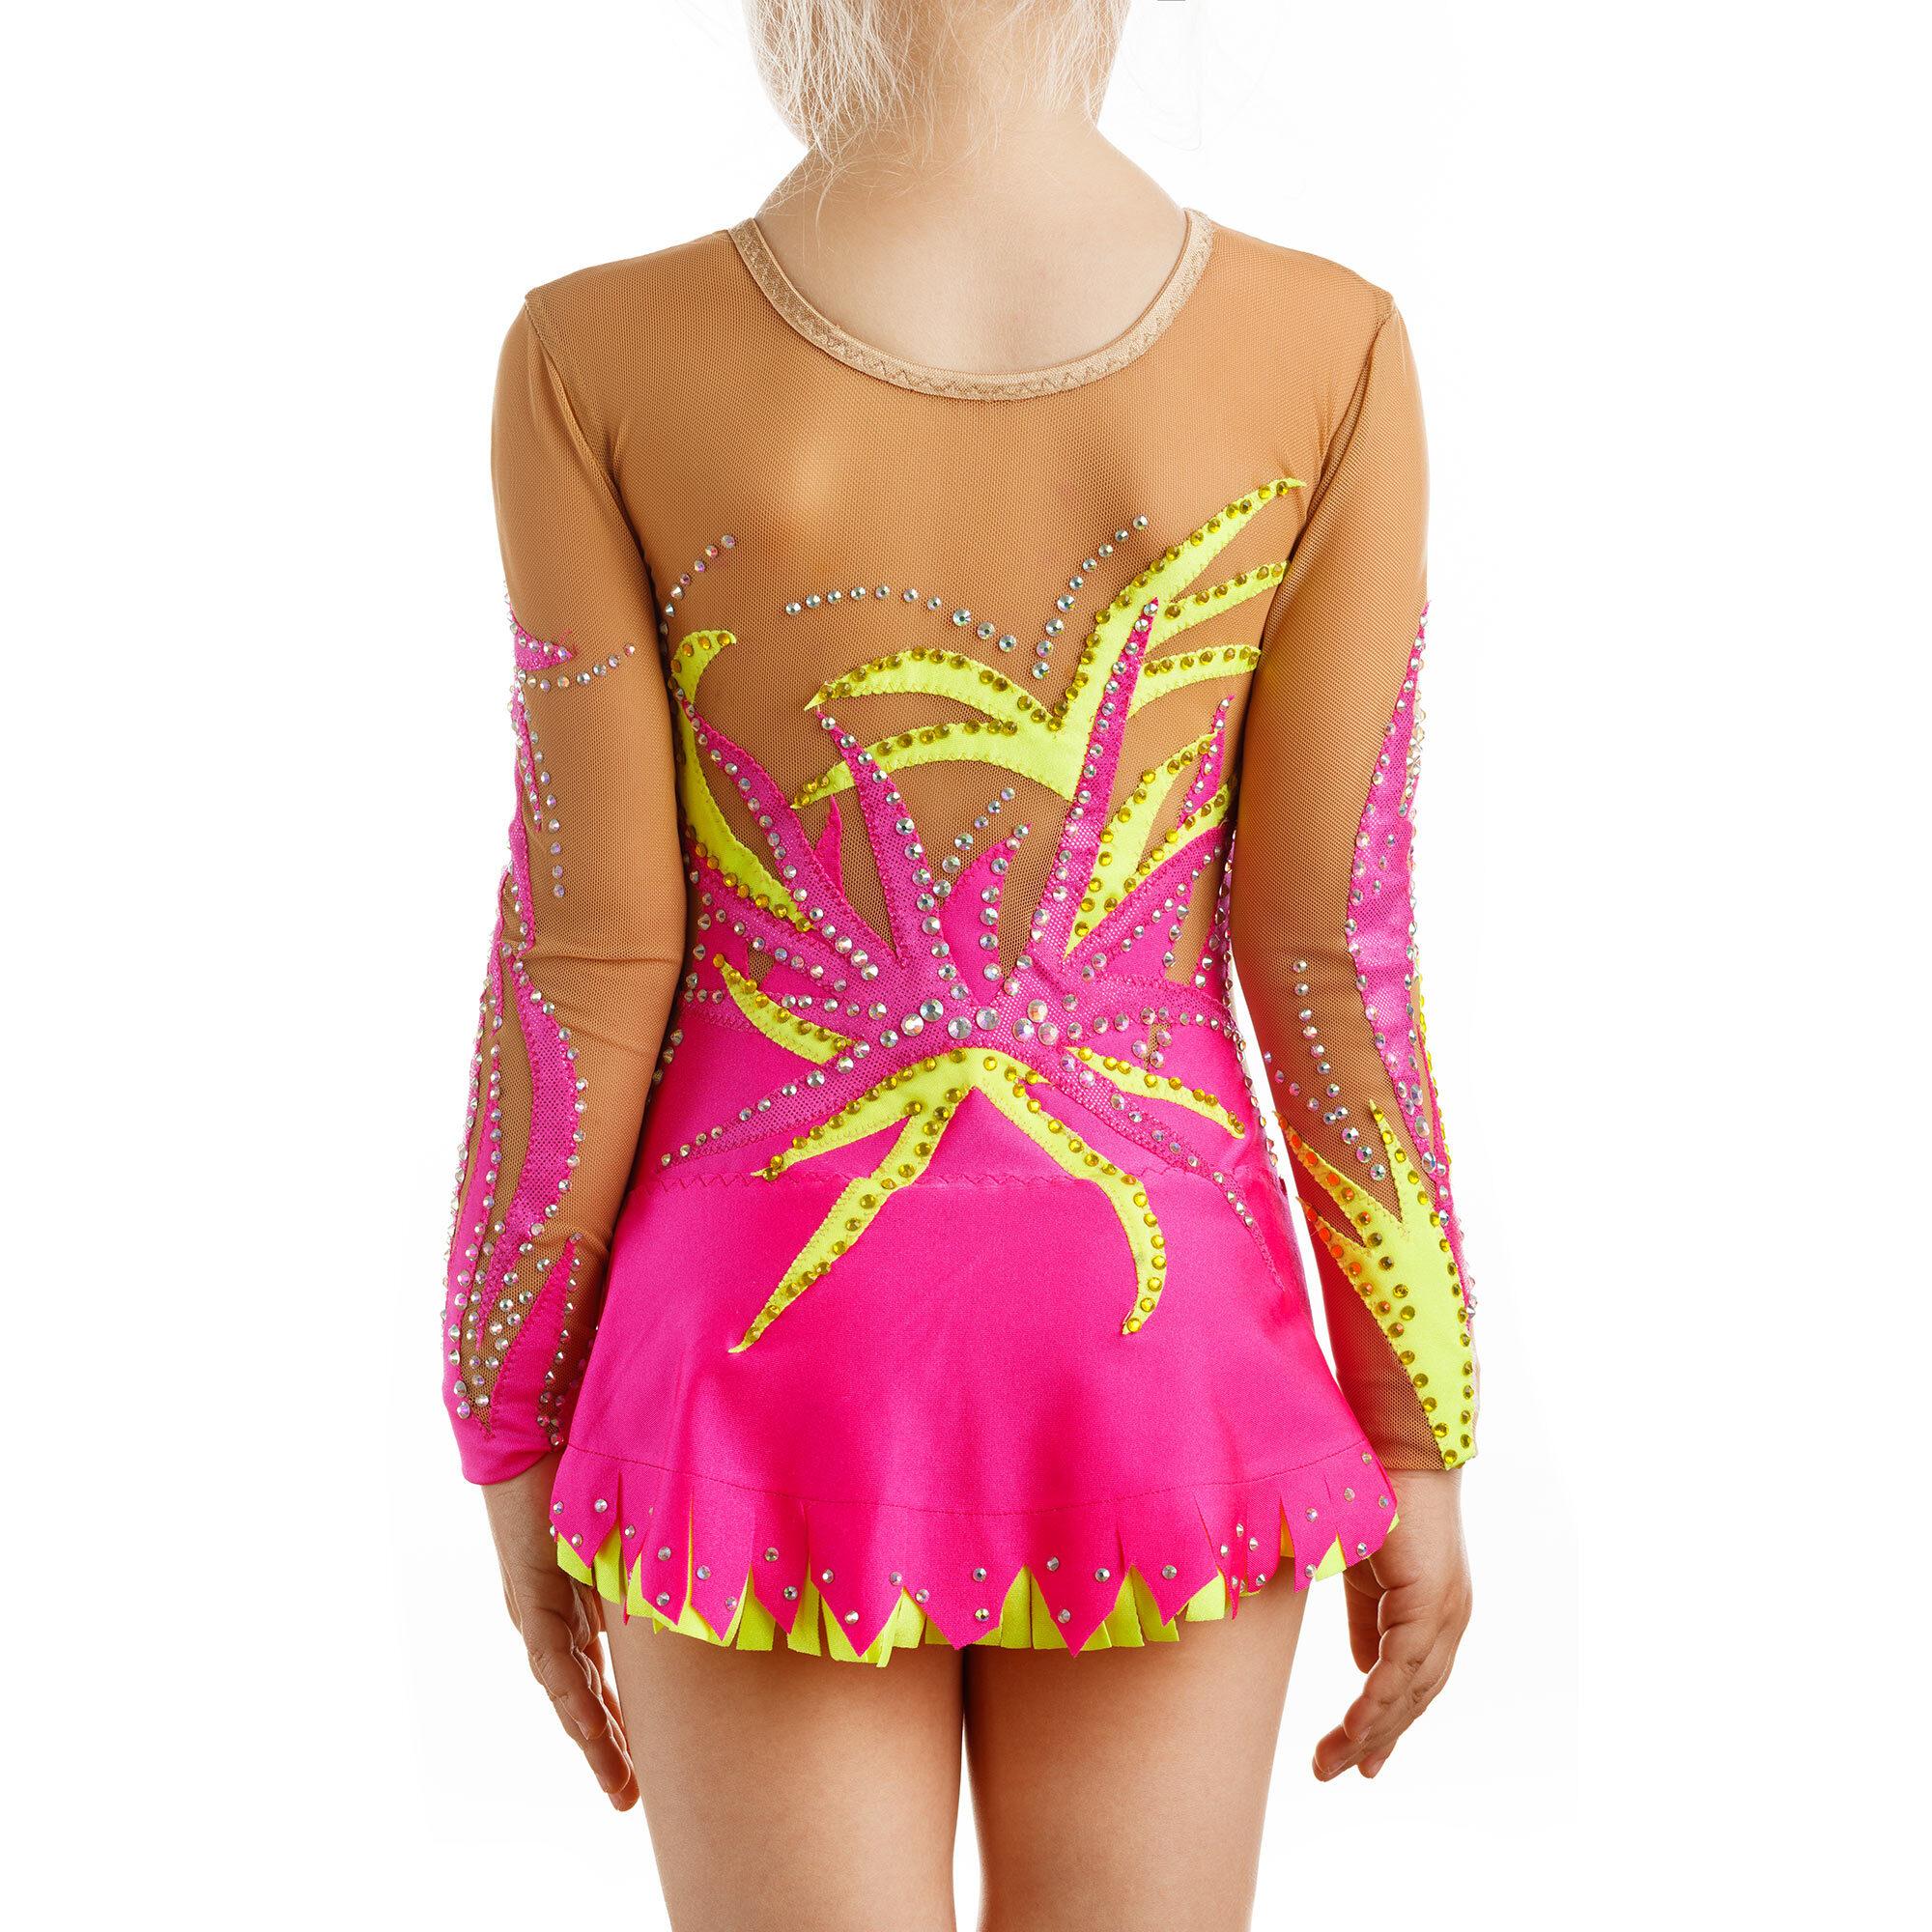 Rhythmic Gymnastics Leotard 197 made in Magenta, lemon & mesh colors